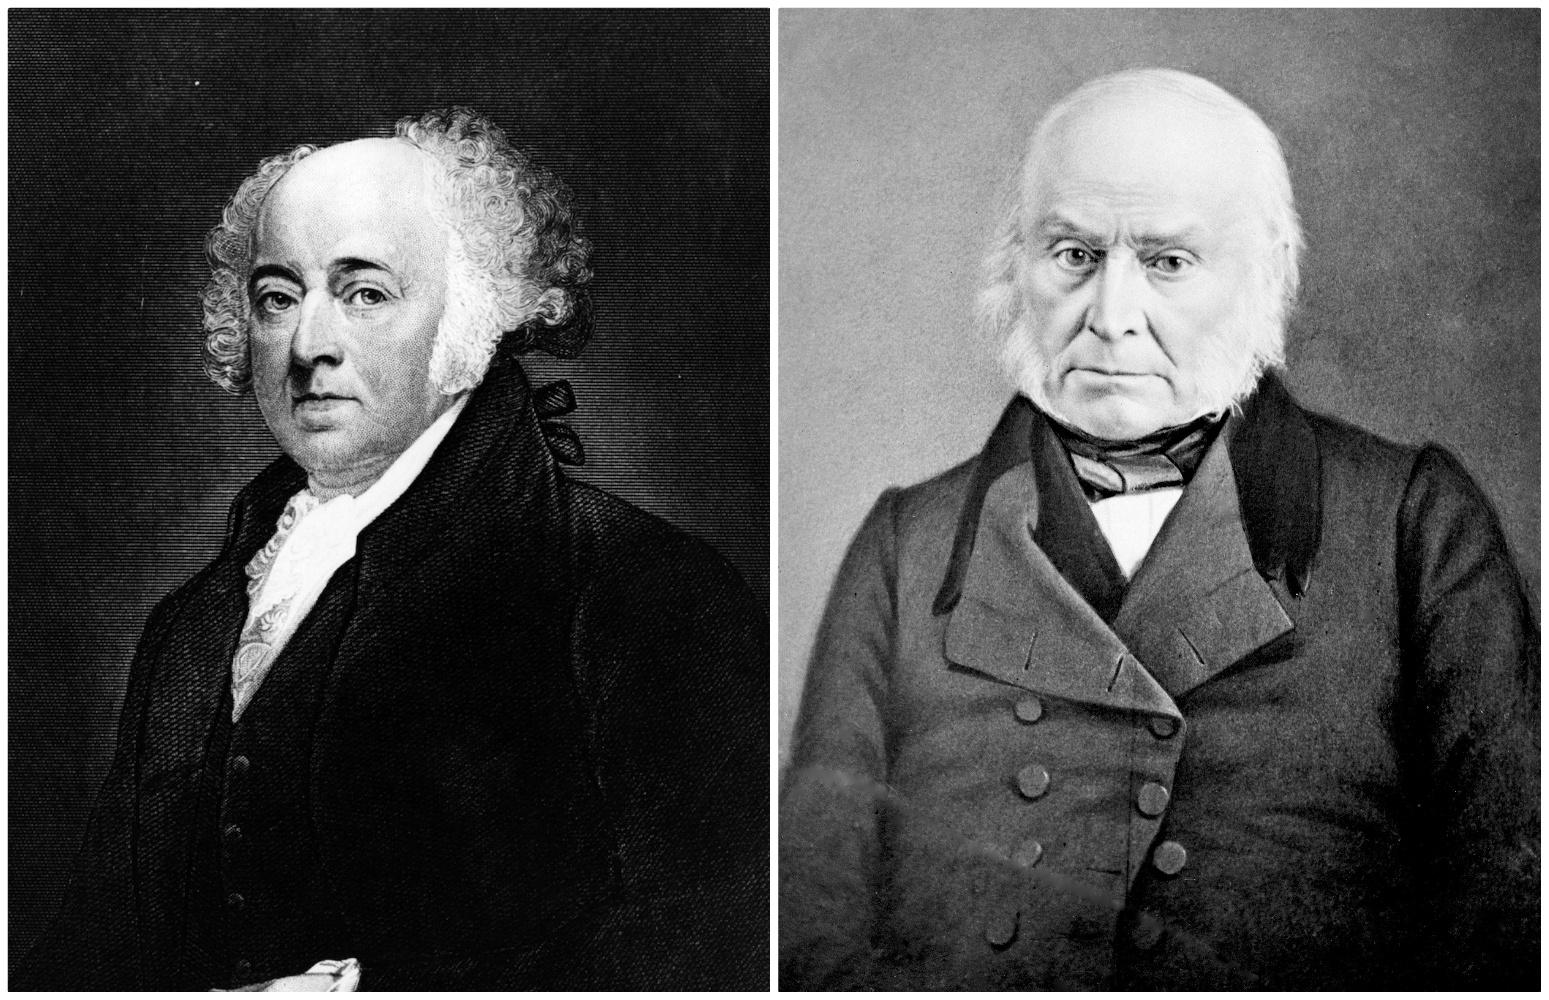 John and John Quincy Adams photo collage